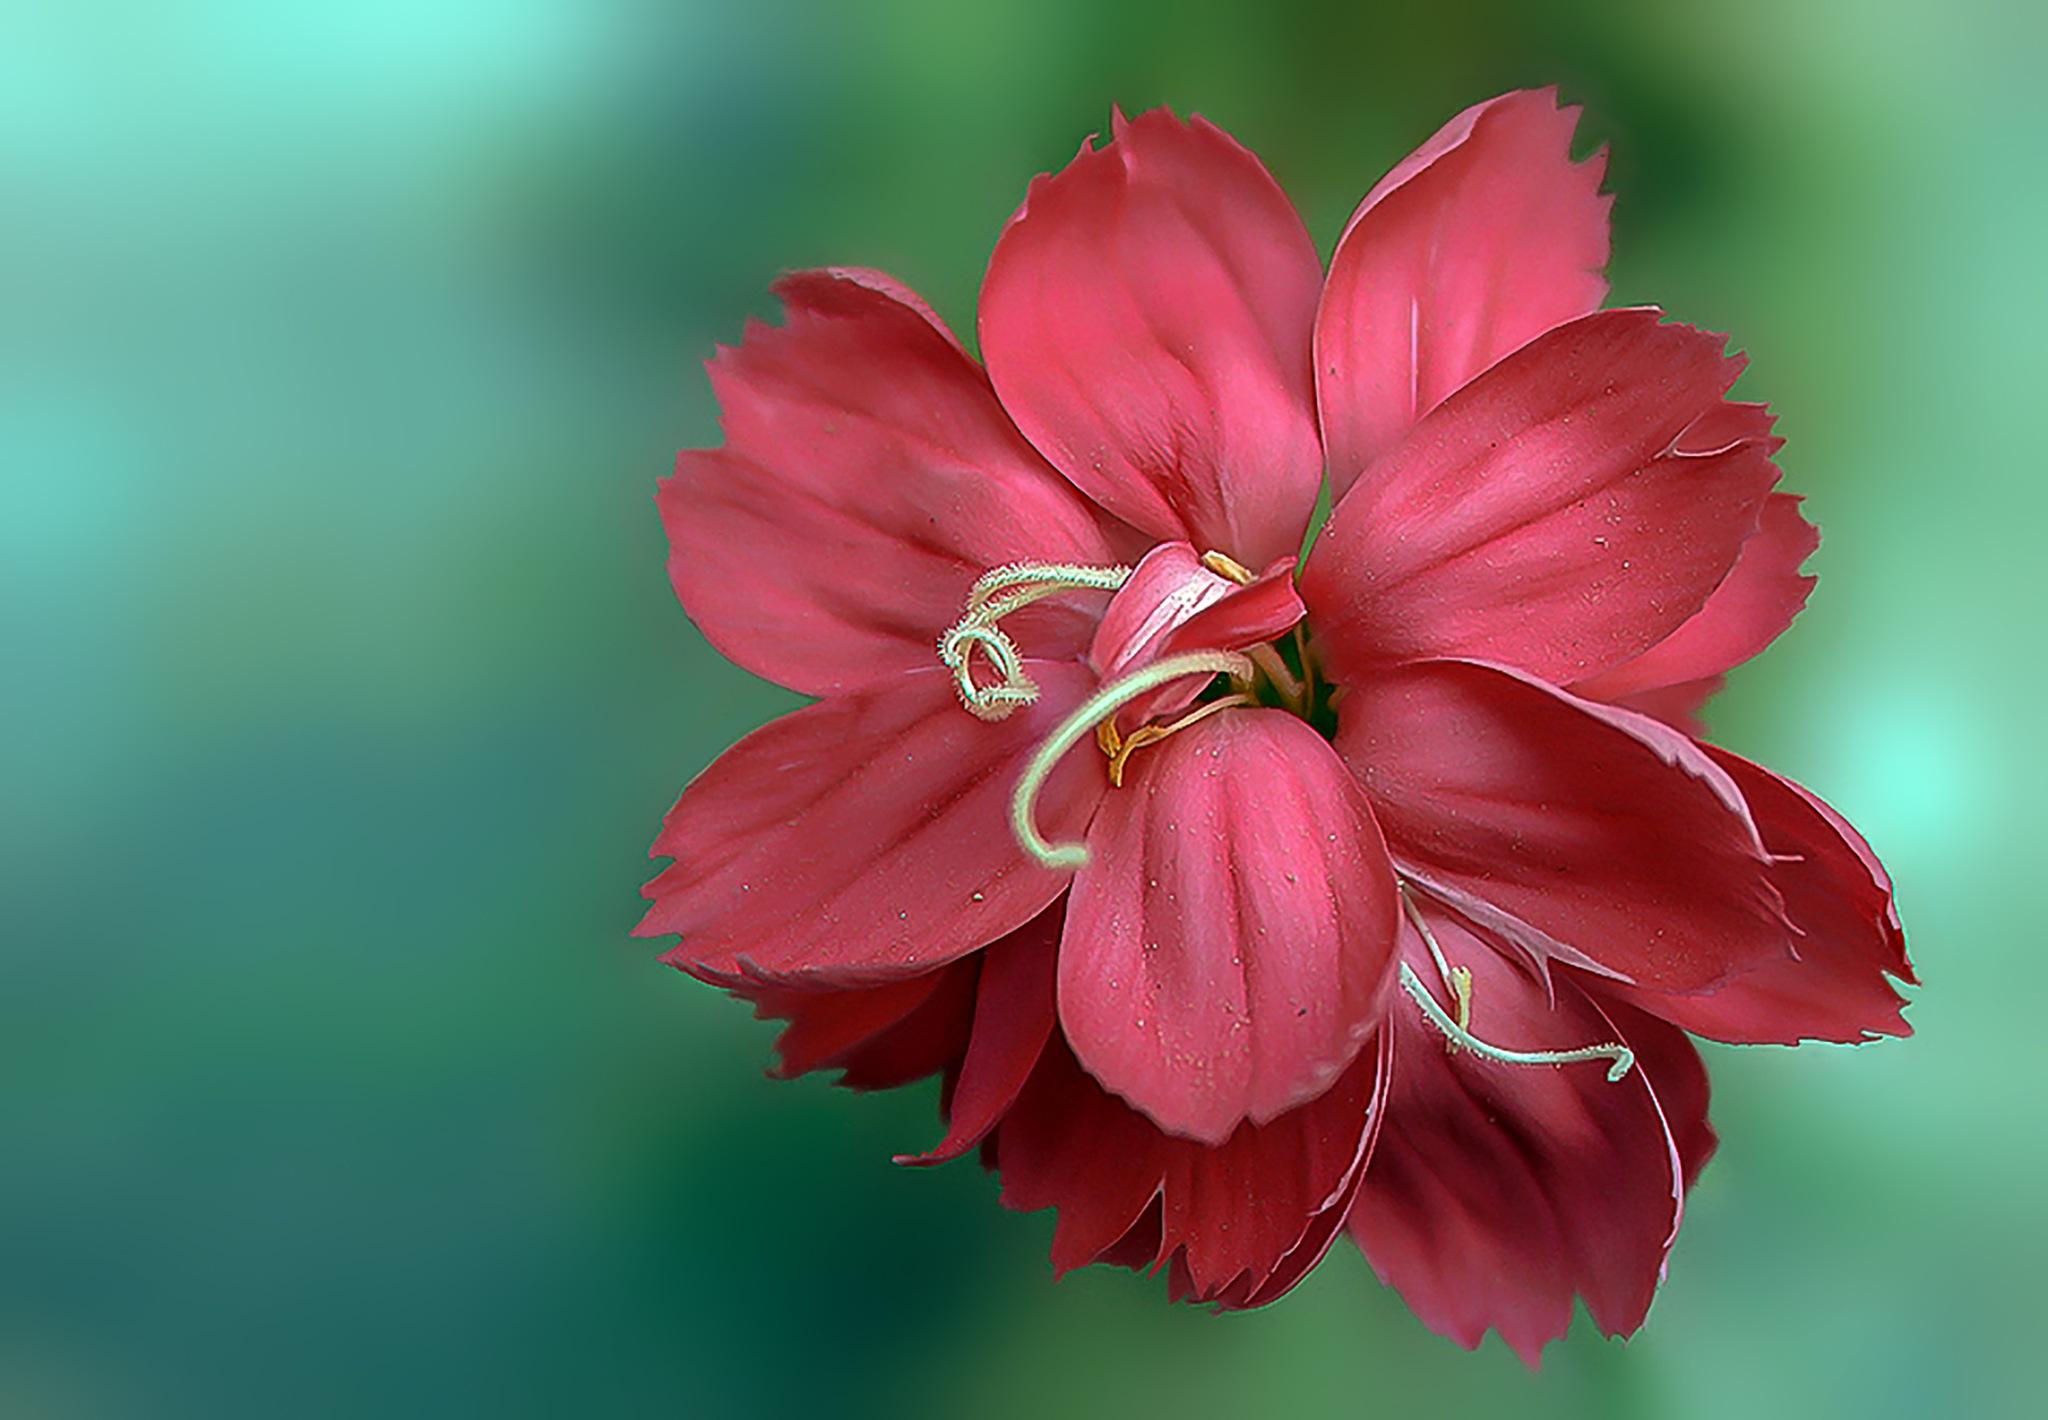 Red Carnation Flower Opening. by Omar AL-NAAS